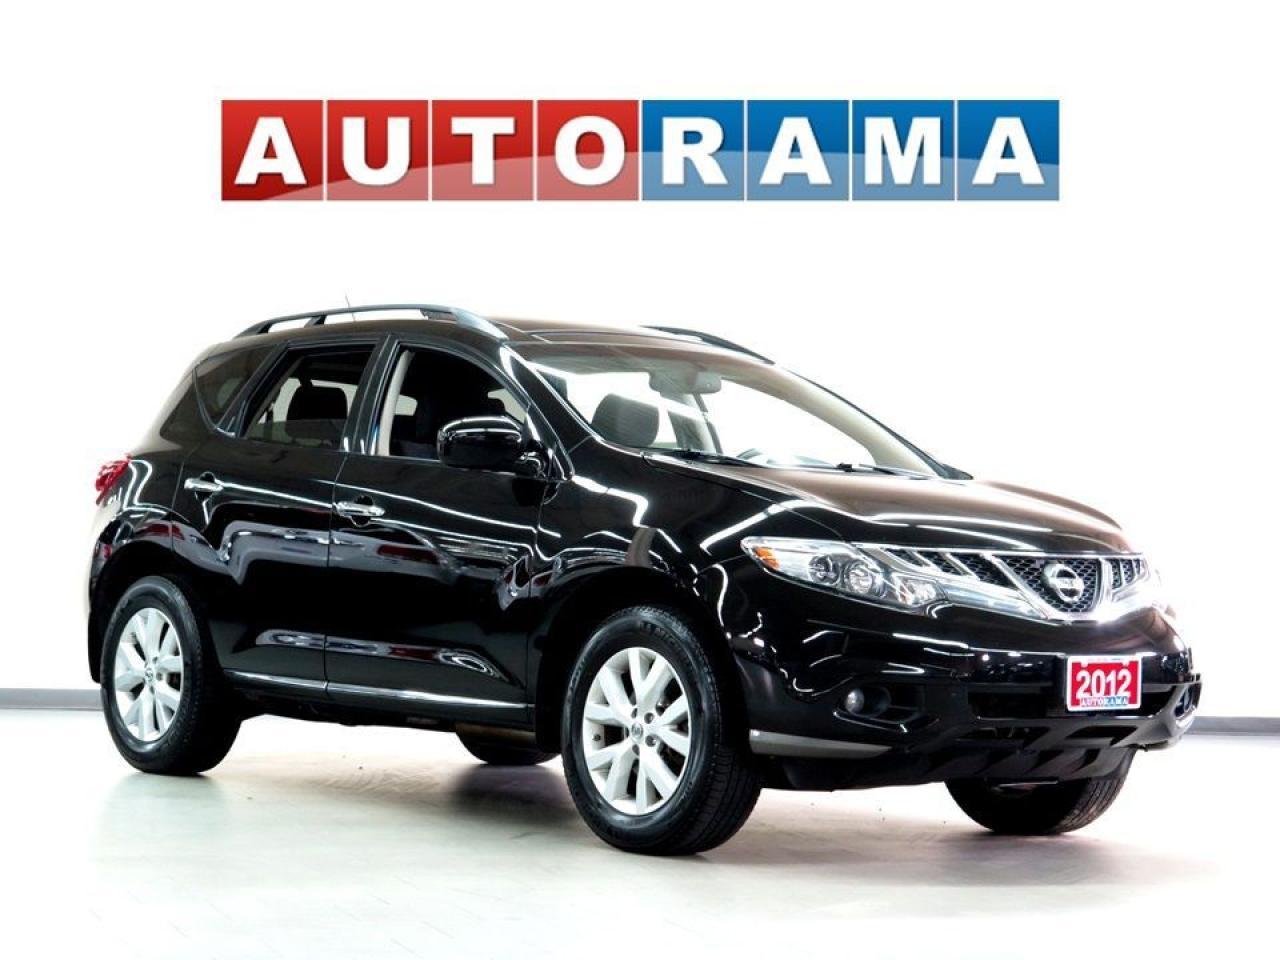 2012 Nissan Murano PANORAMIC SUNROOF AWD BACK UP CAMERA